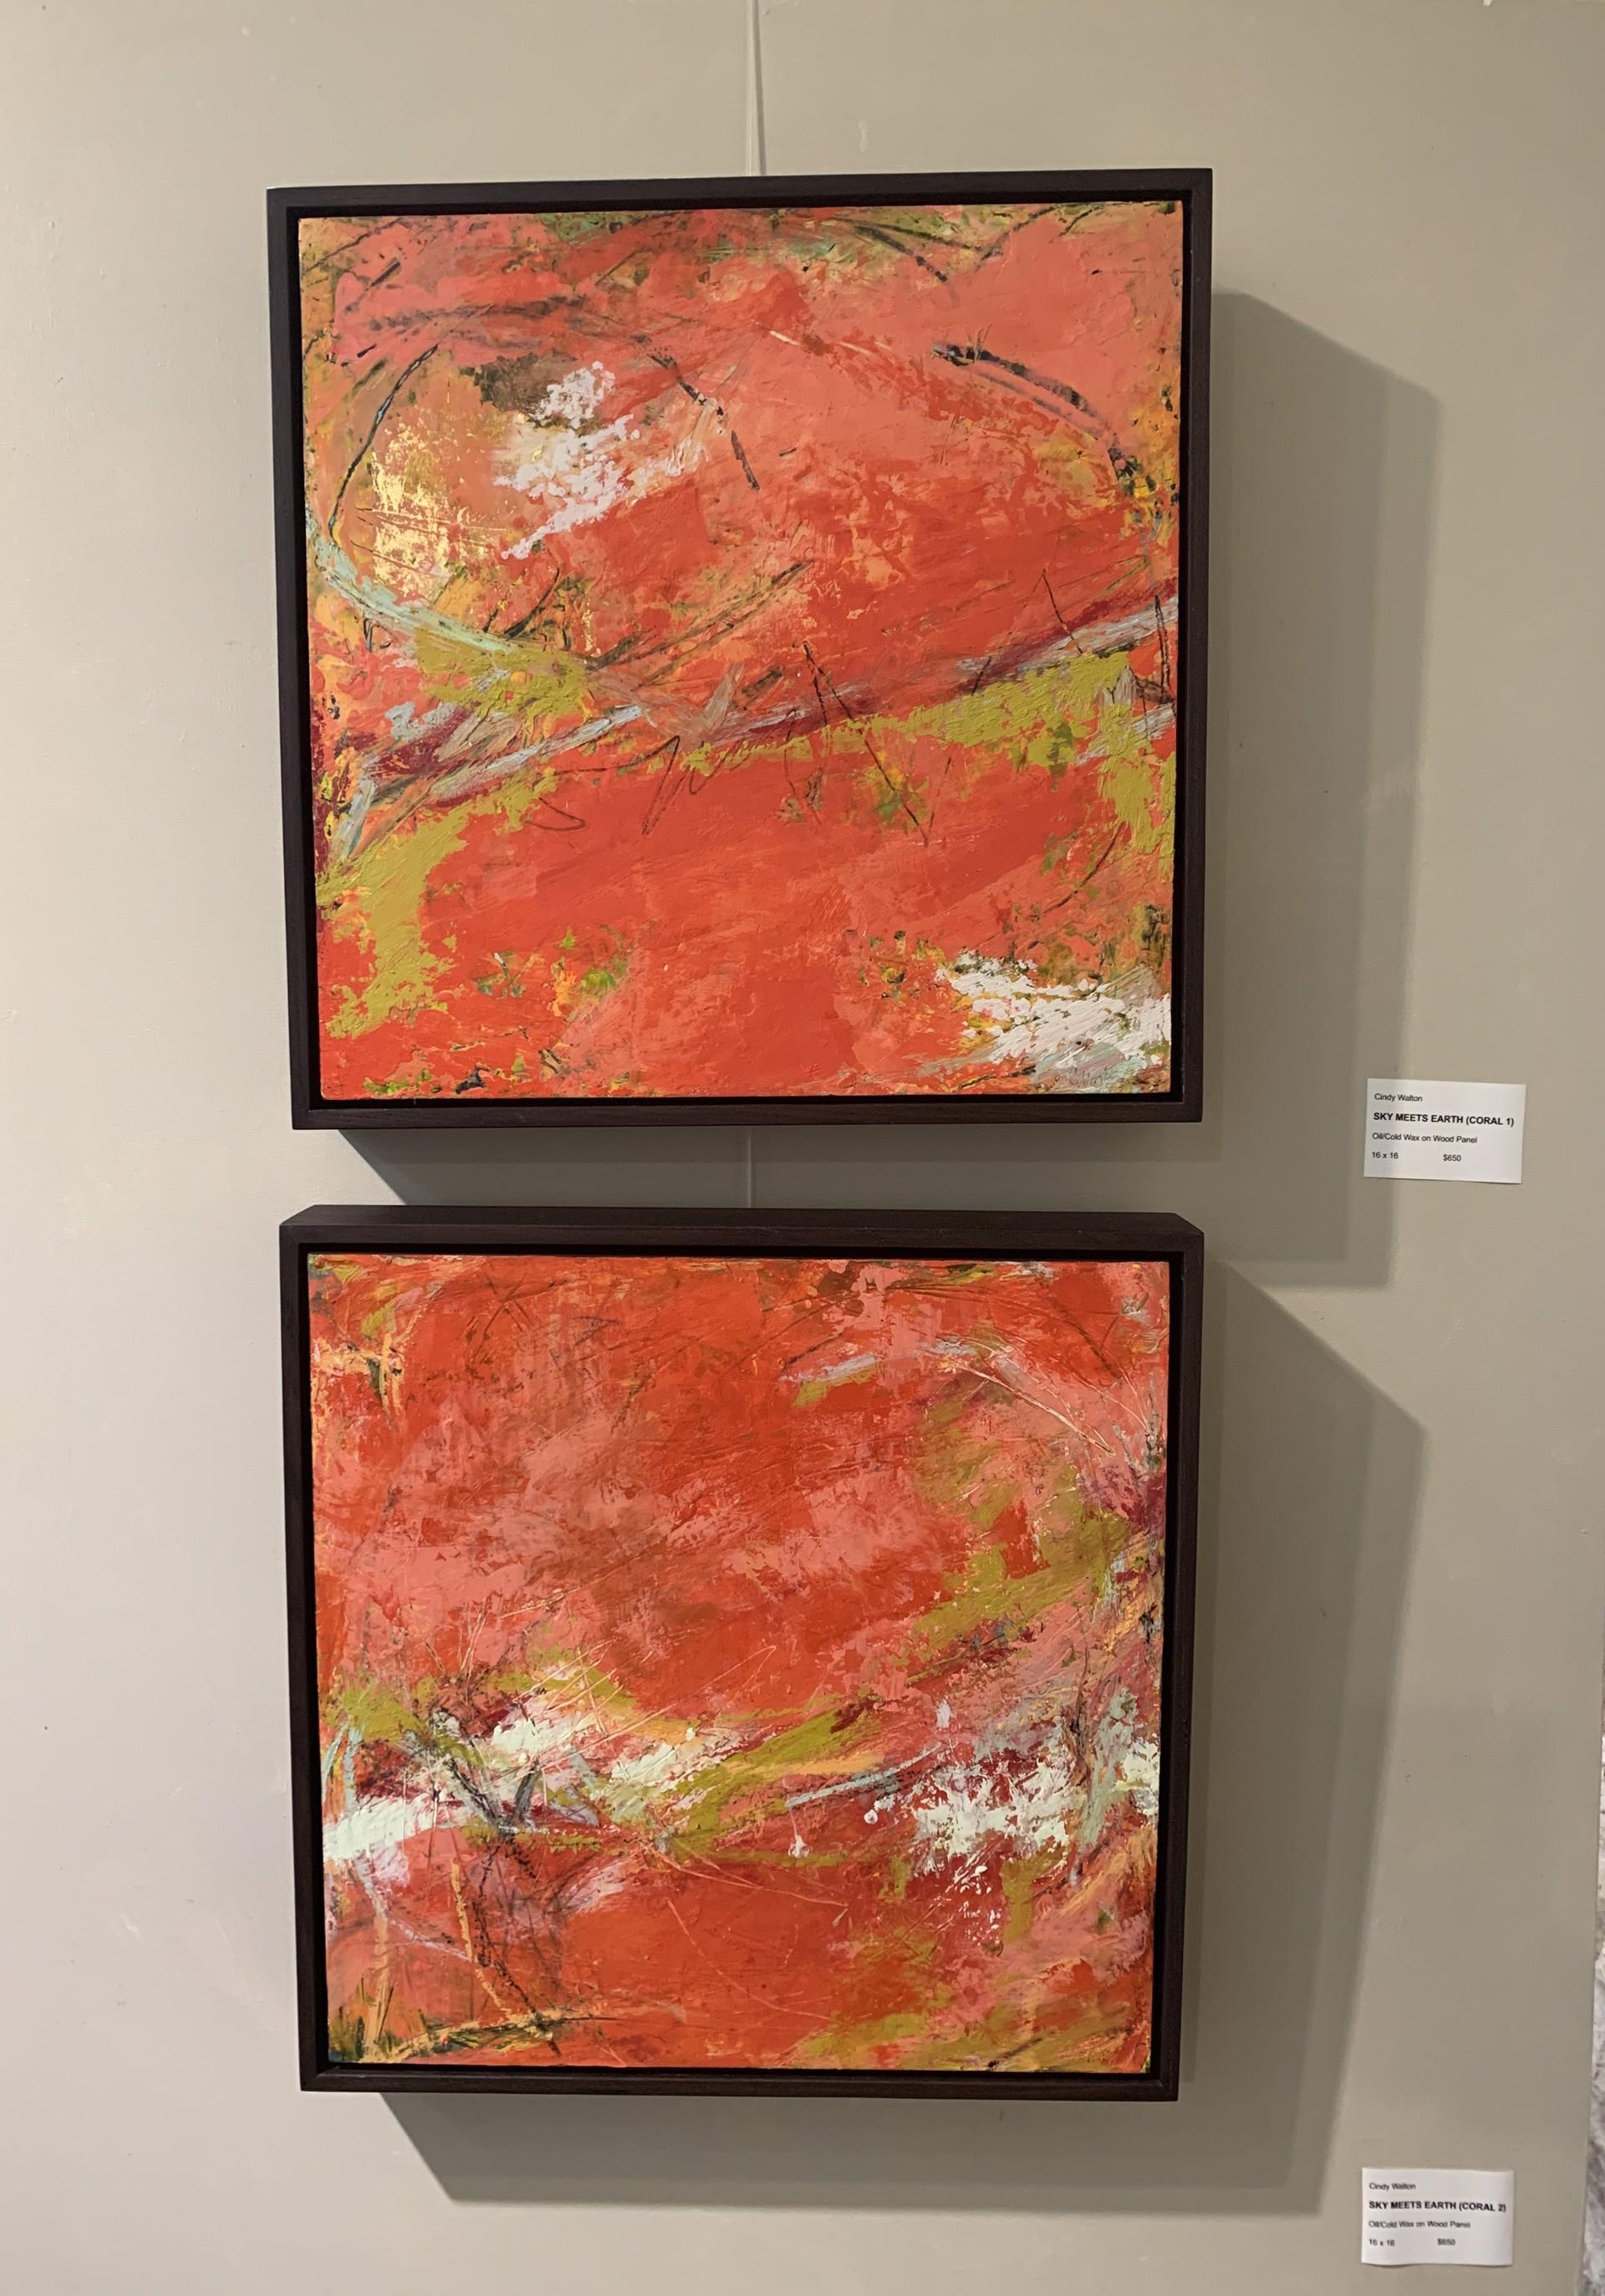 Sky Meets Earth (Coral 2) by Cindy Walton